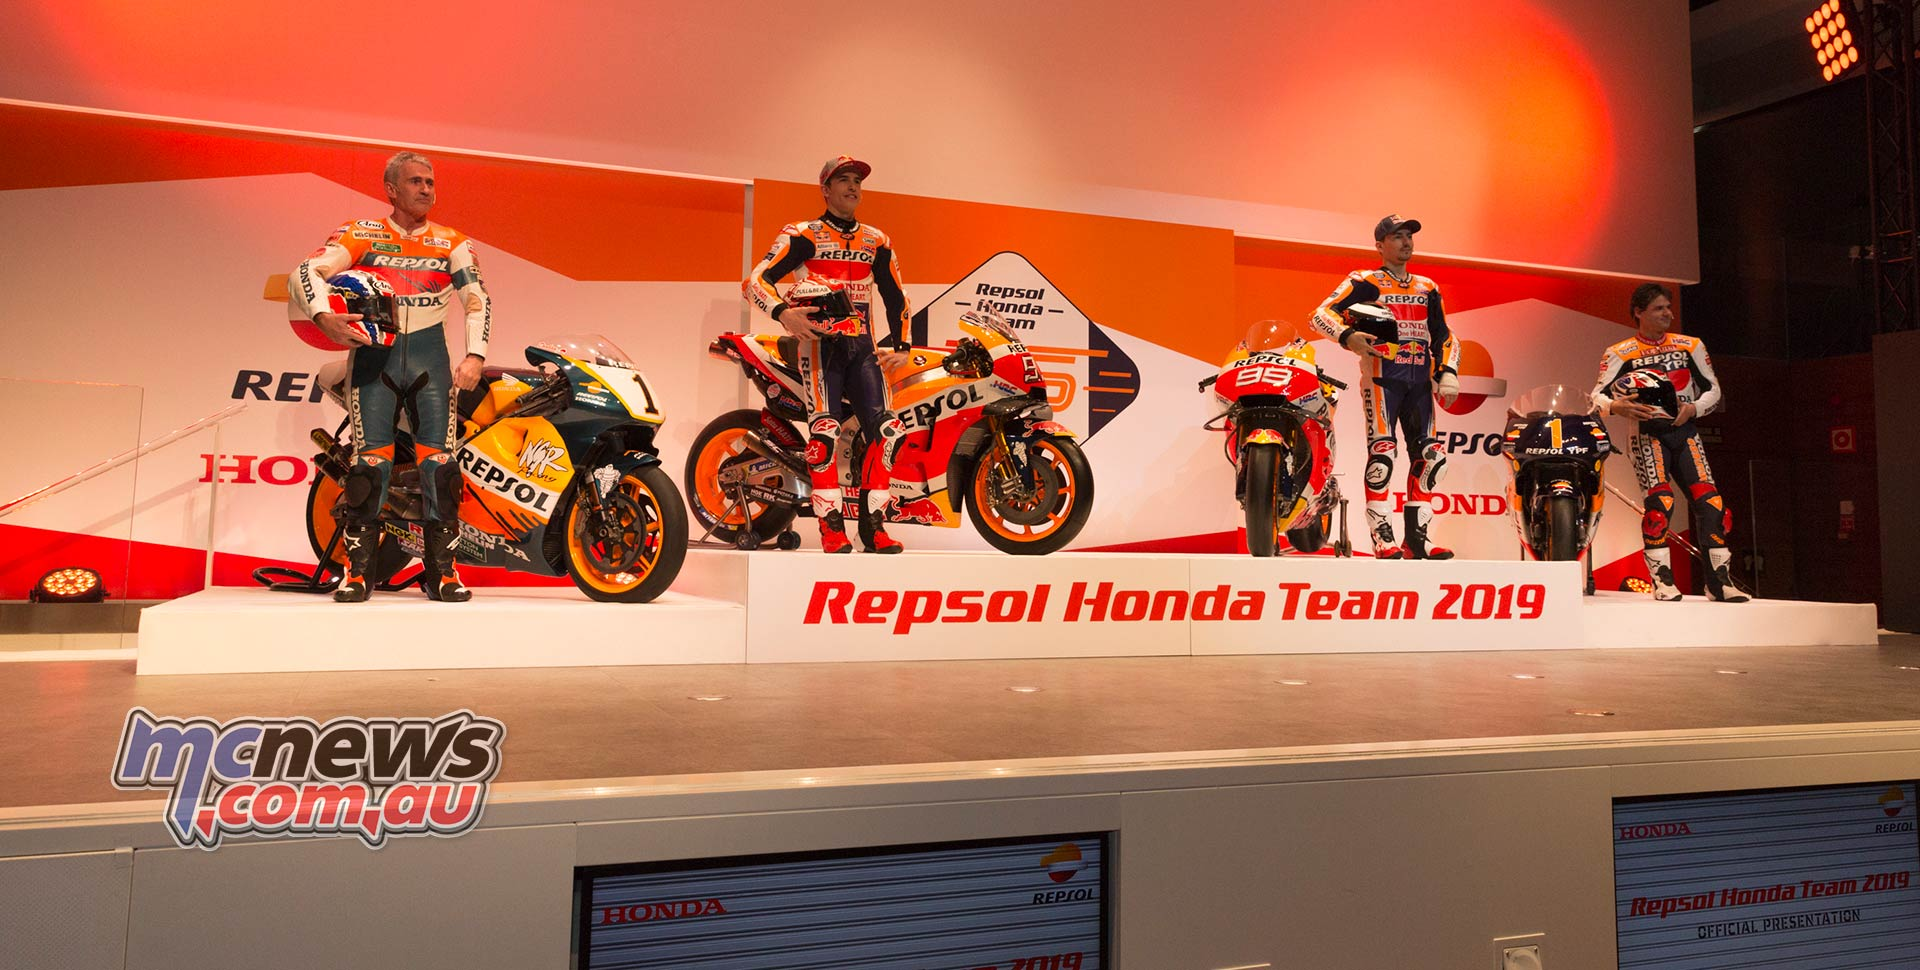 2019 Repsol Honda Hrc Team Launch Mcnewscomau